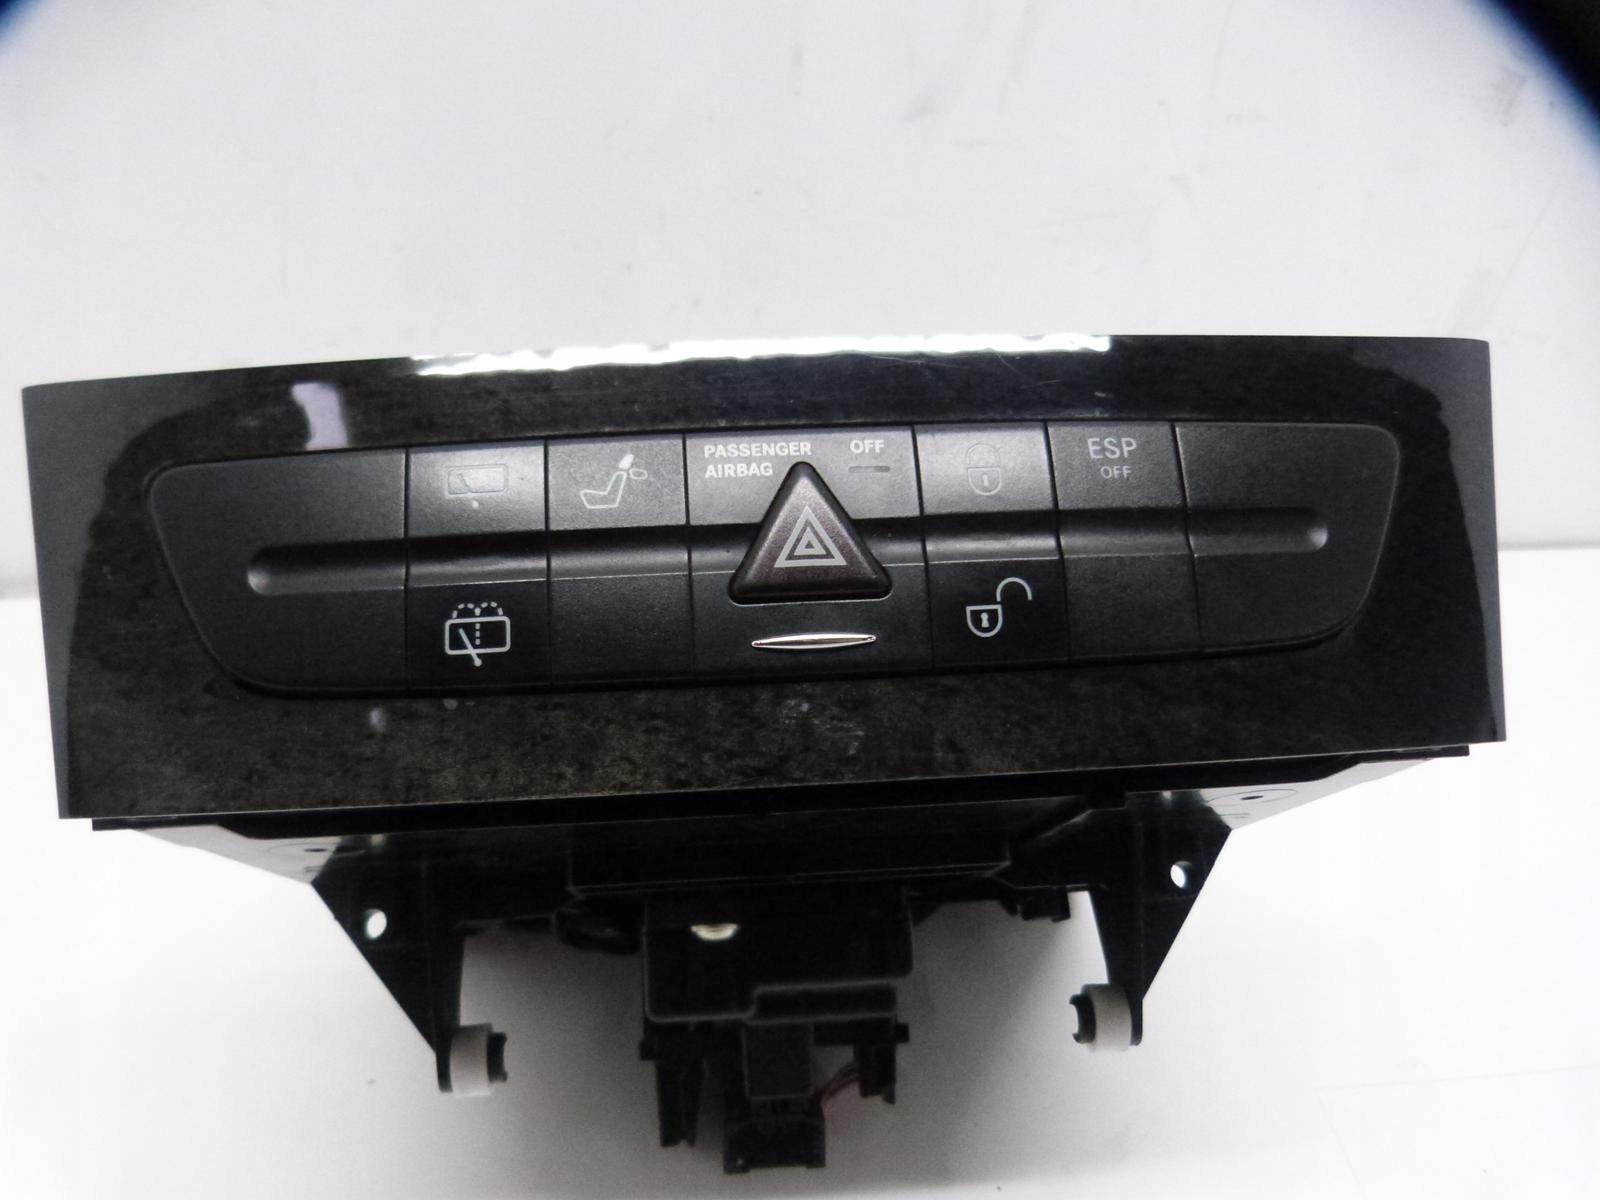 mercedes e w211 cd-чейнджер 6cd панель управления